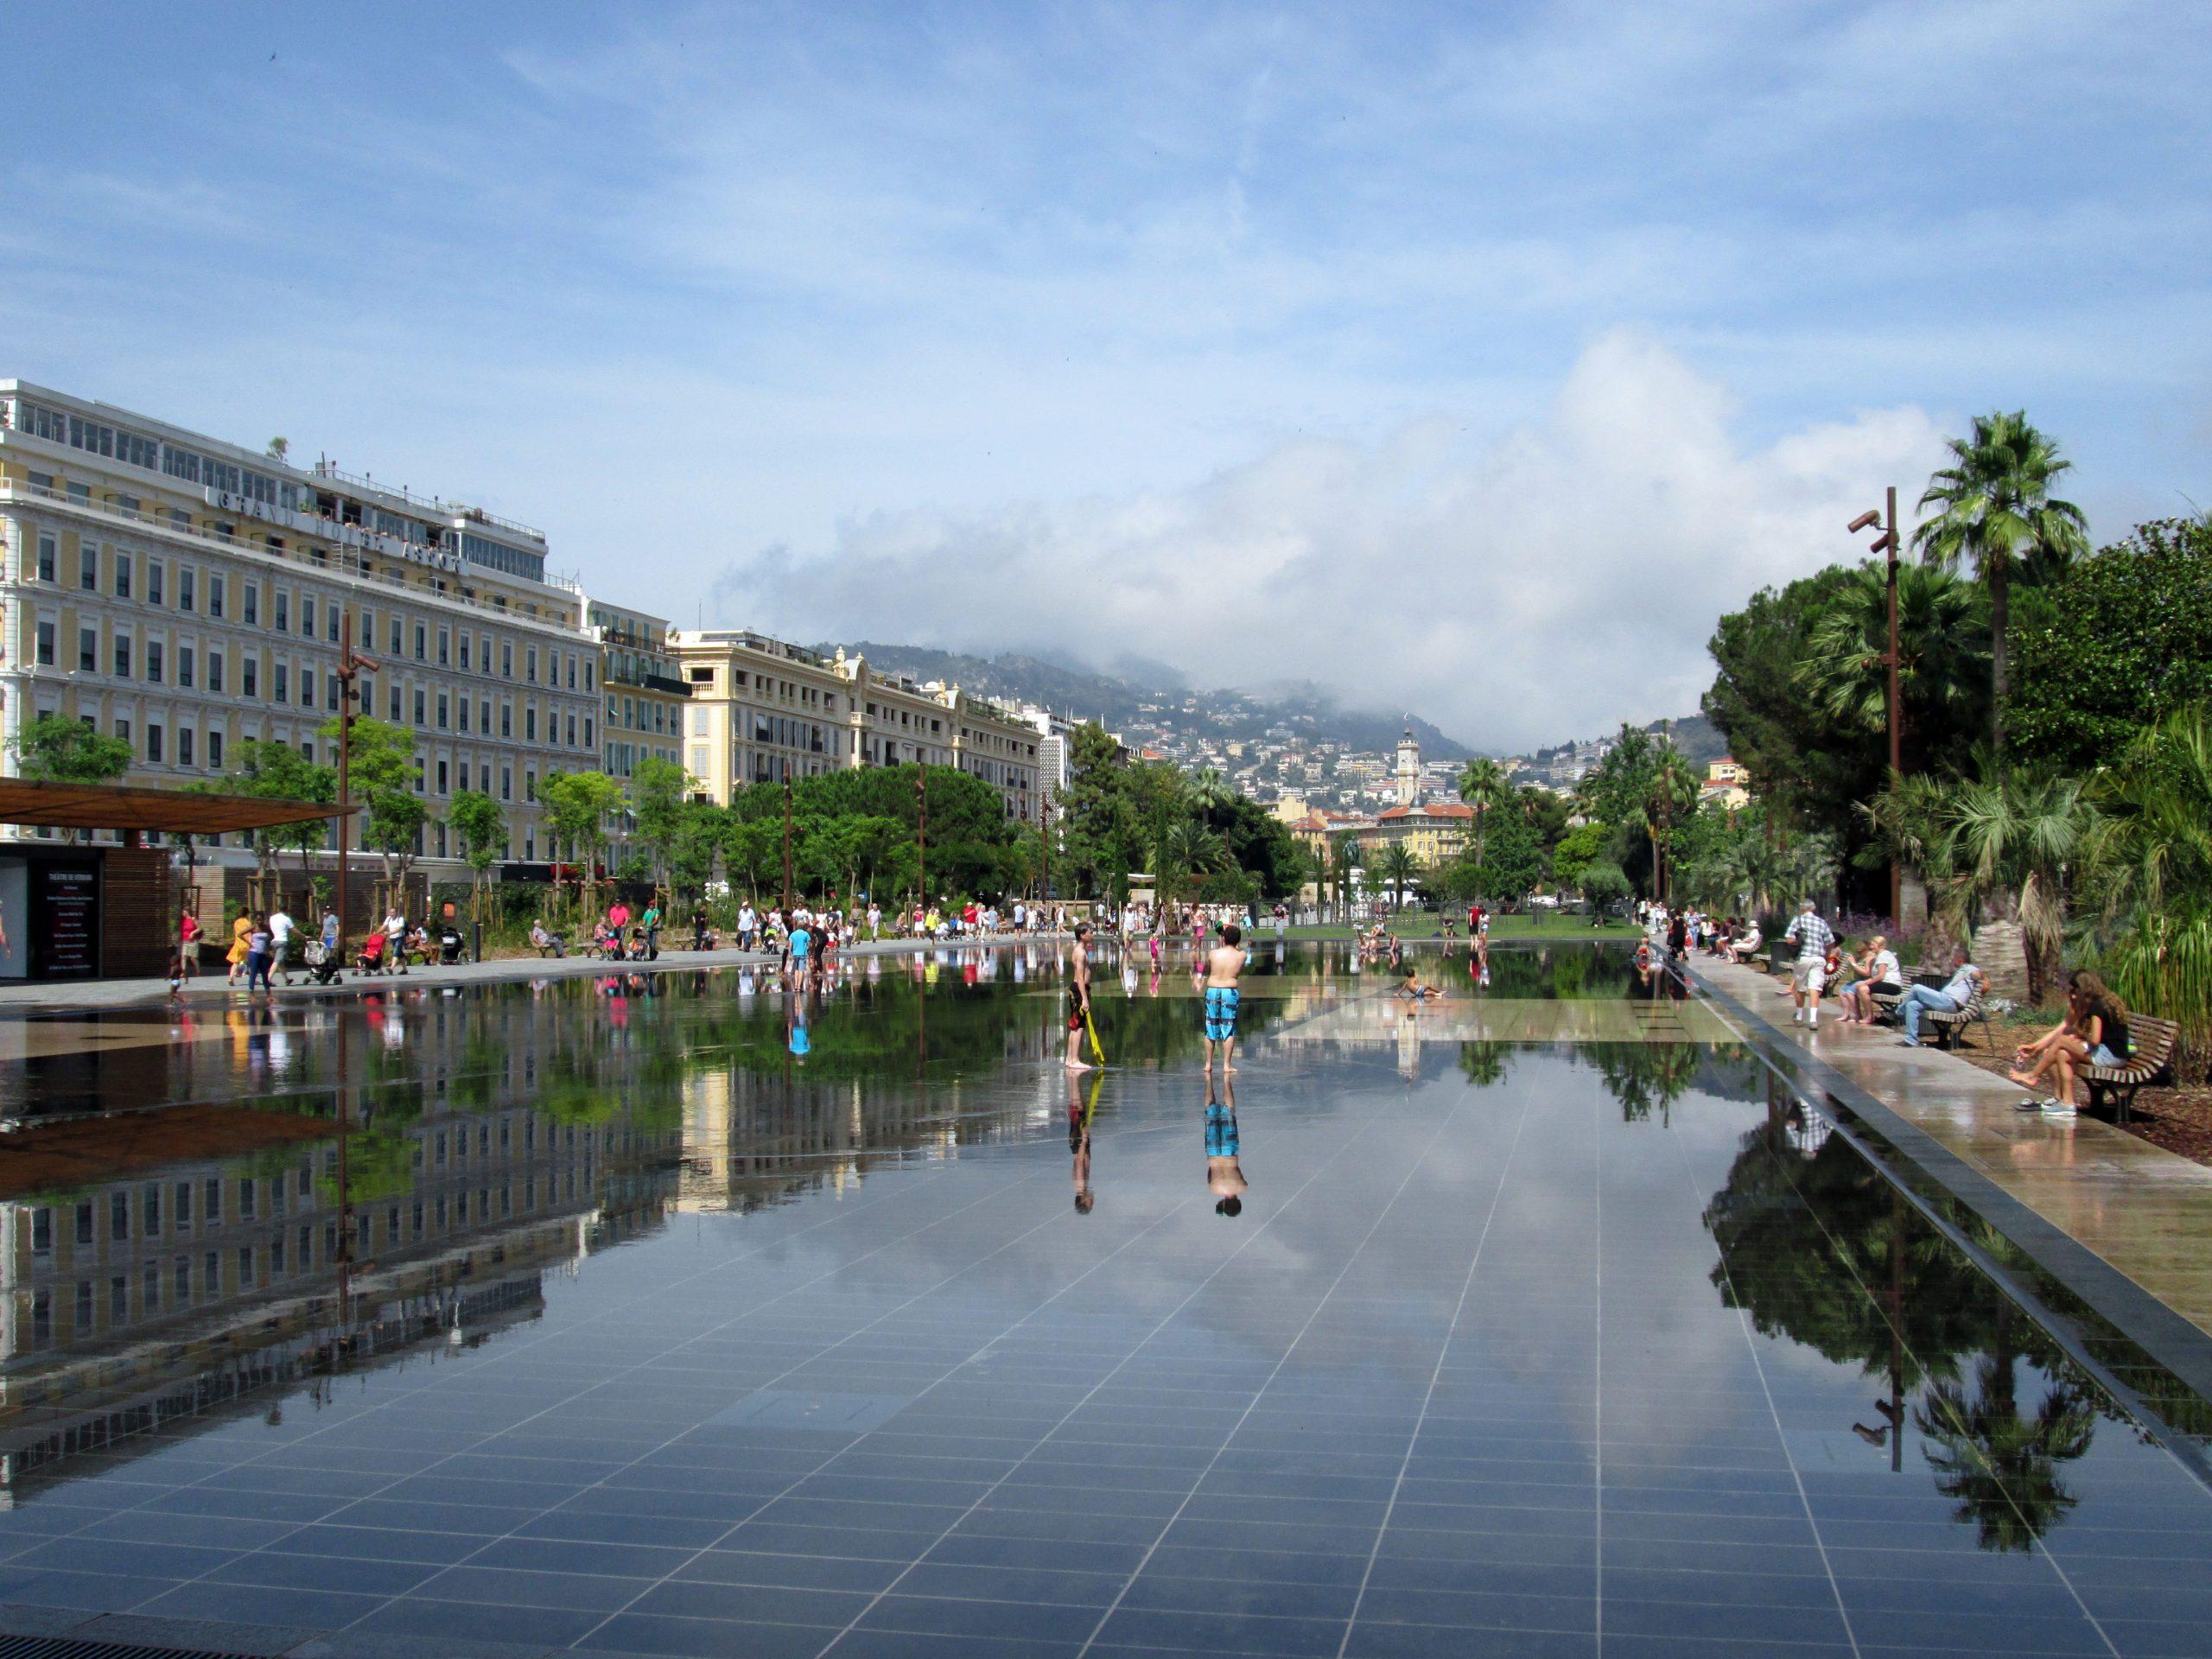 Francuska_Metropole_Nica_park_Palion_botanicka_basta_autobusom_akcija_popust